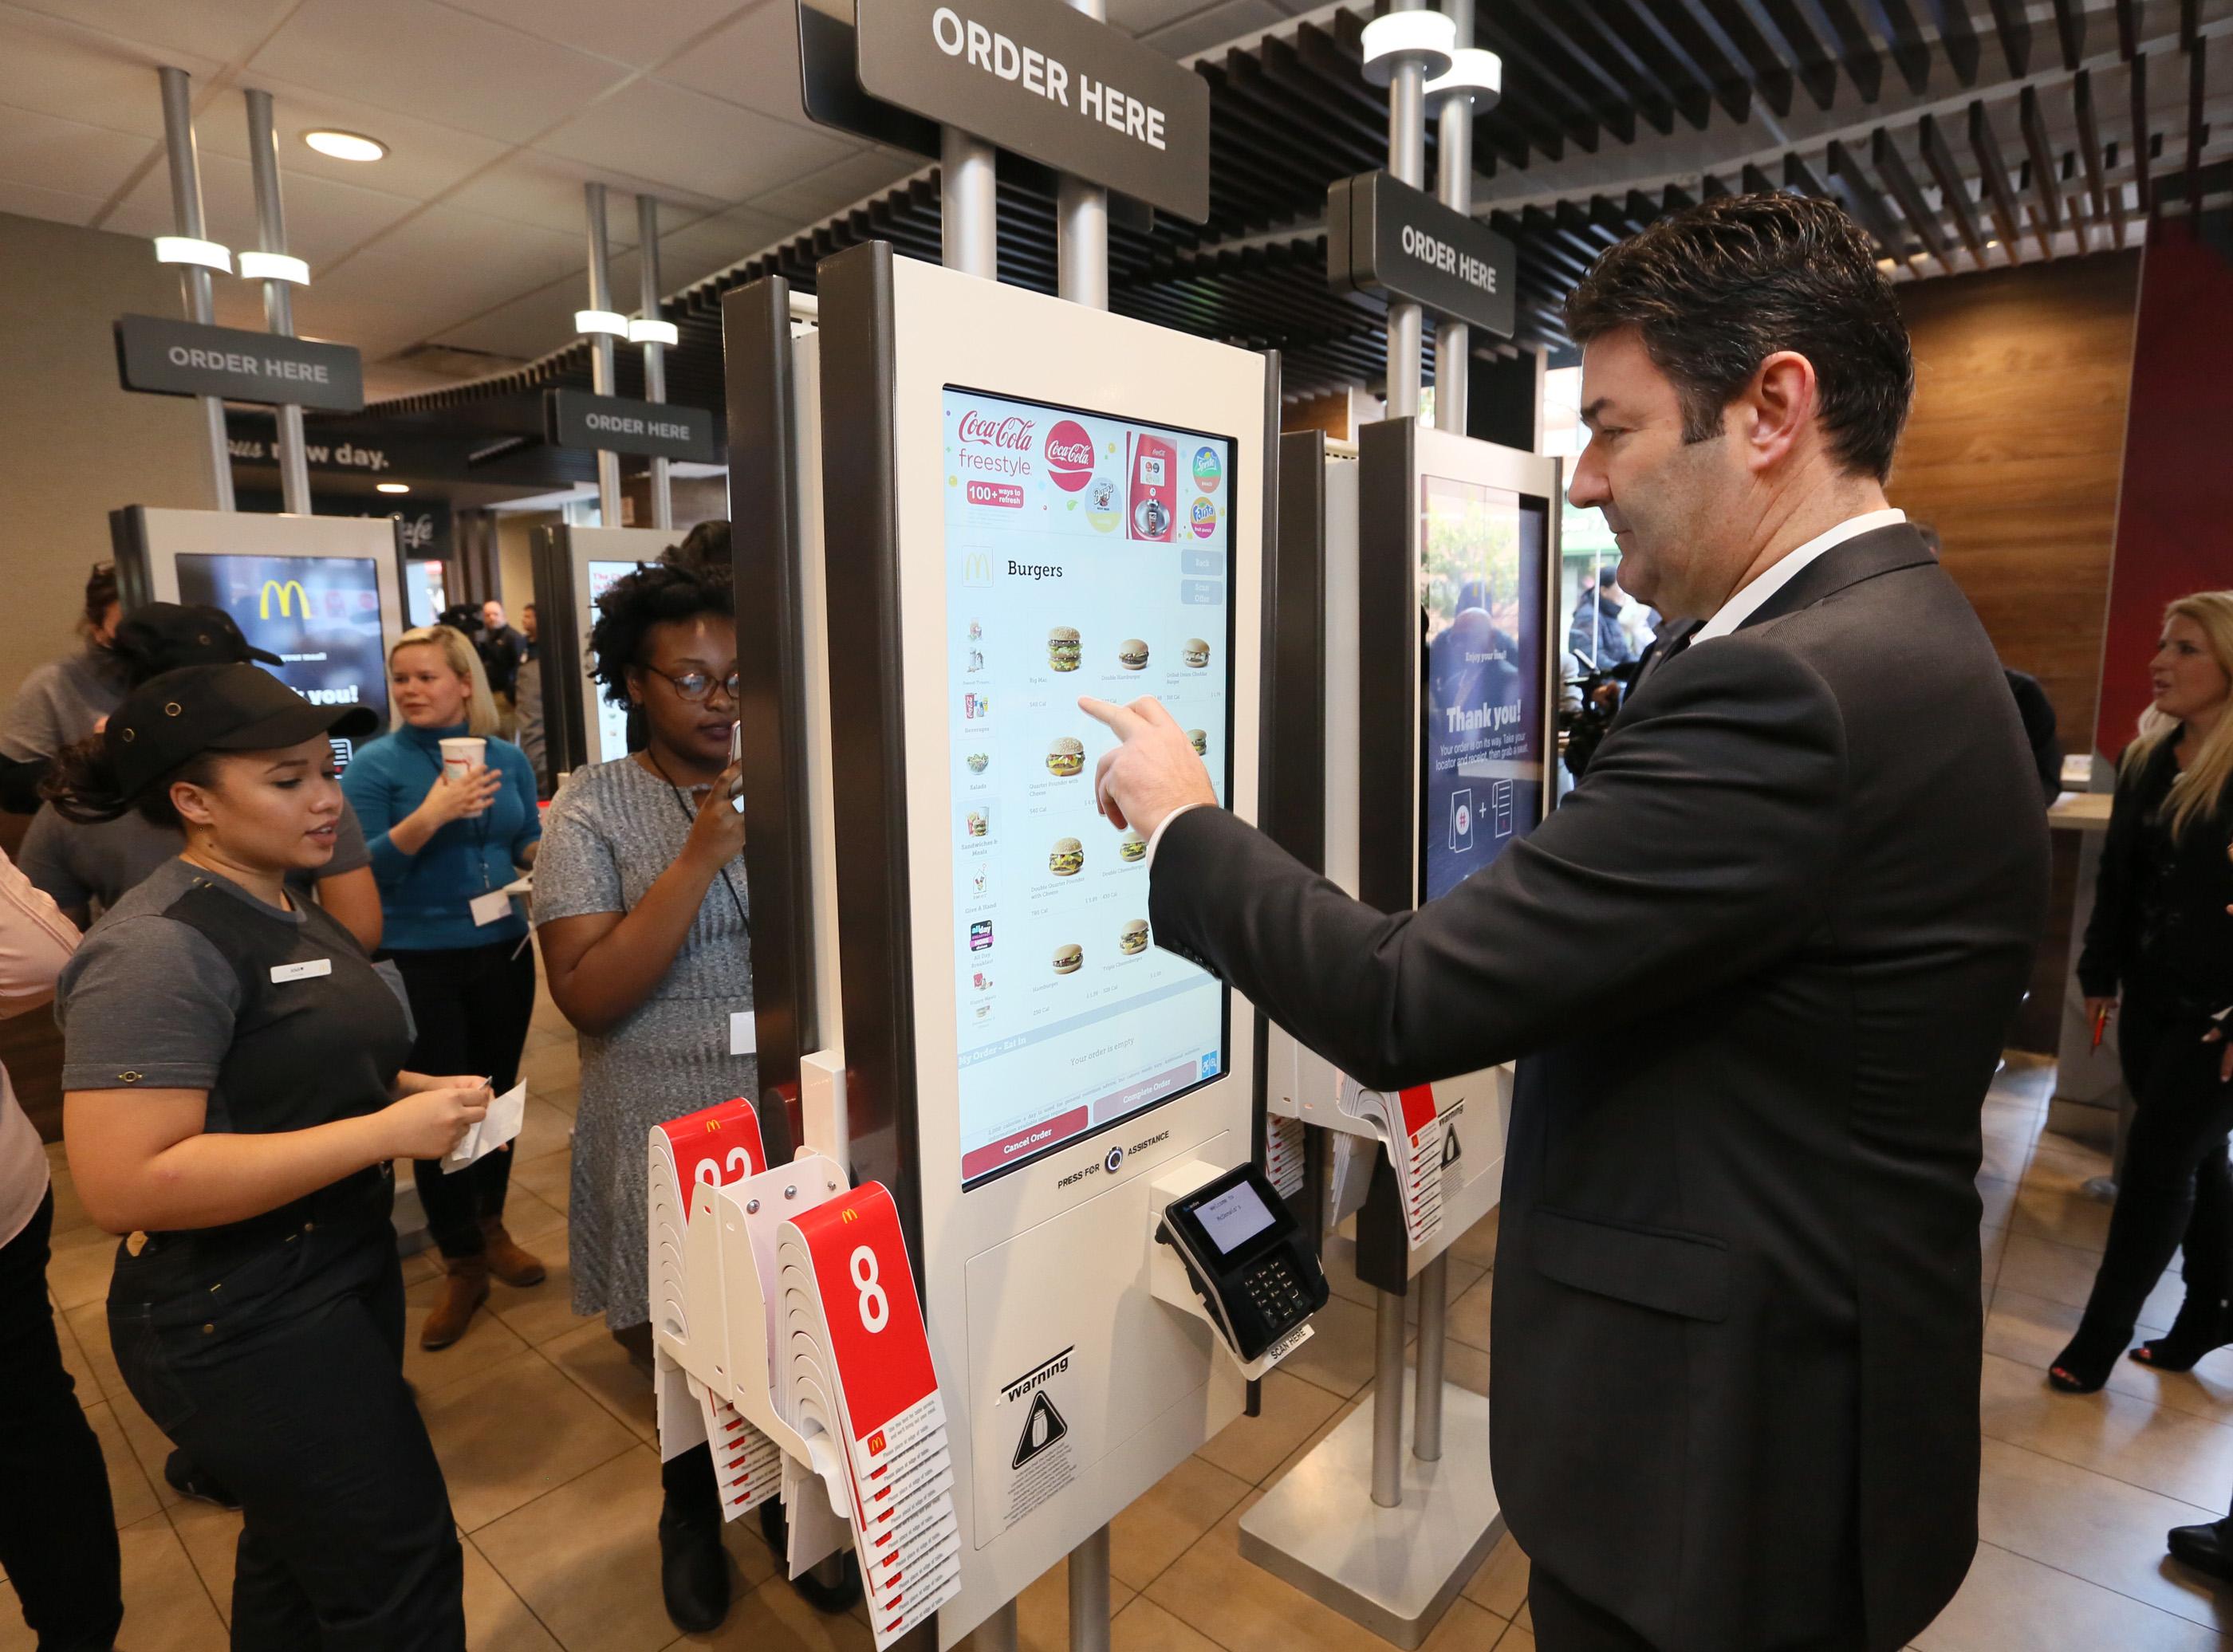 mcdonalds plans restaurant improvements potentially like these ordering kiosks